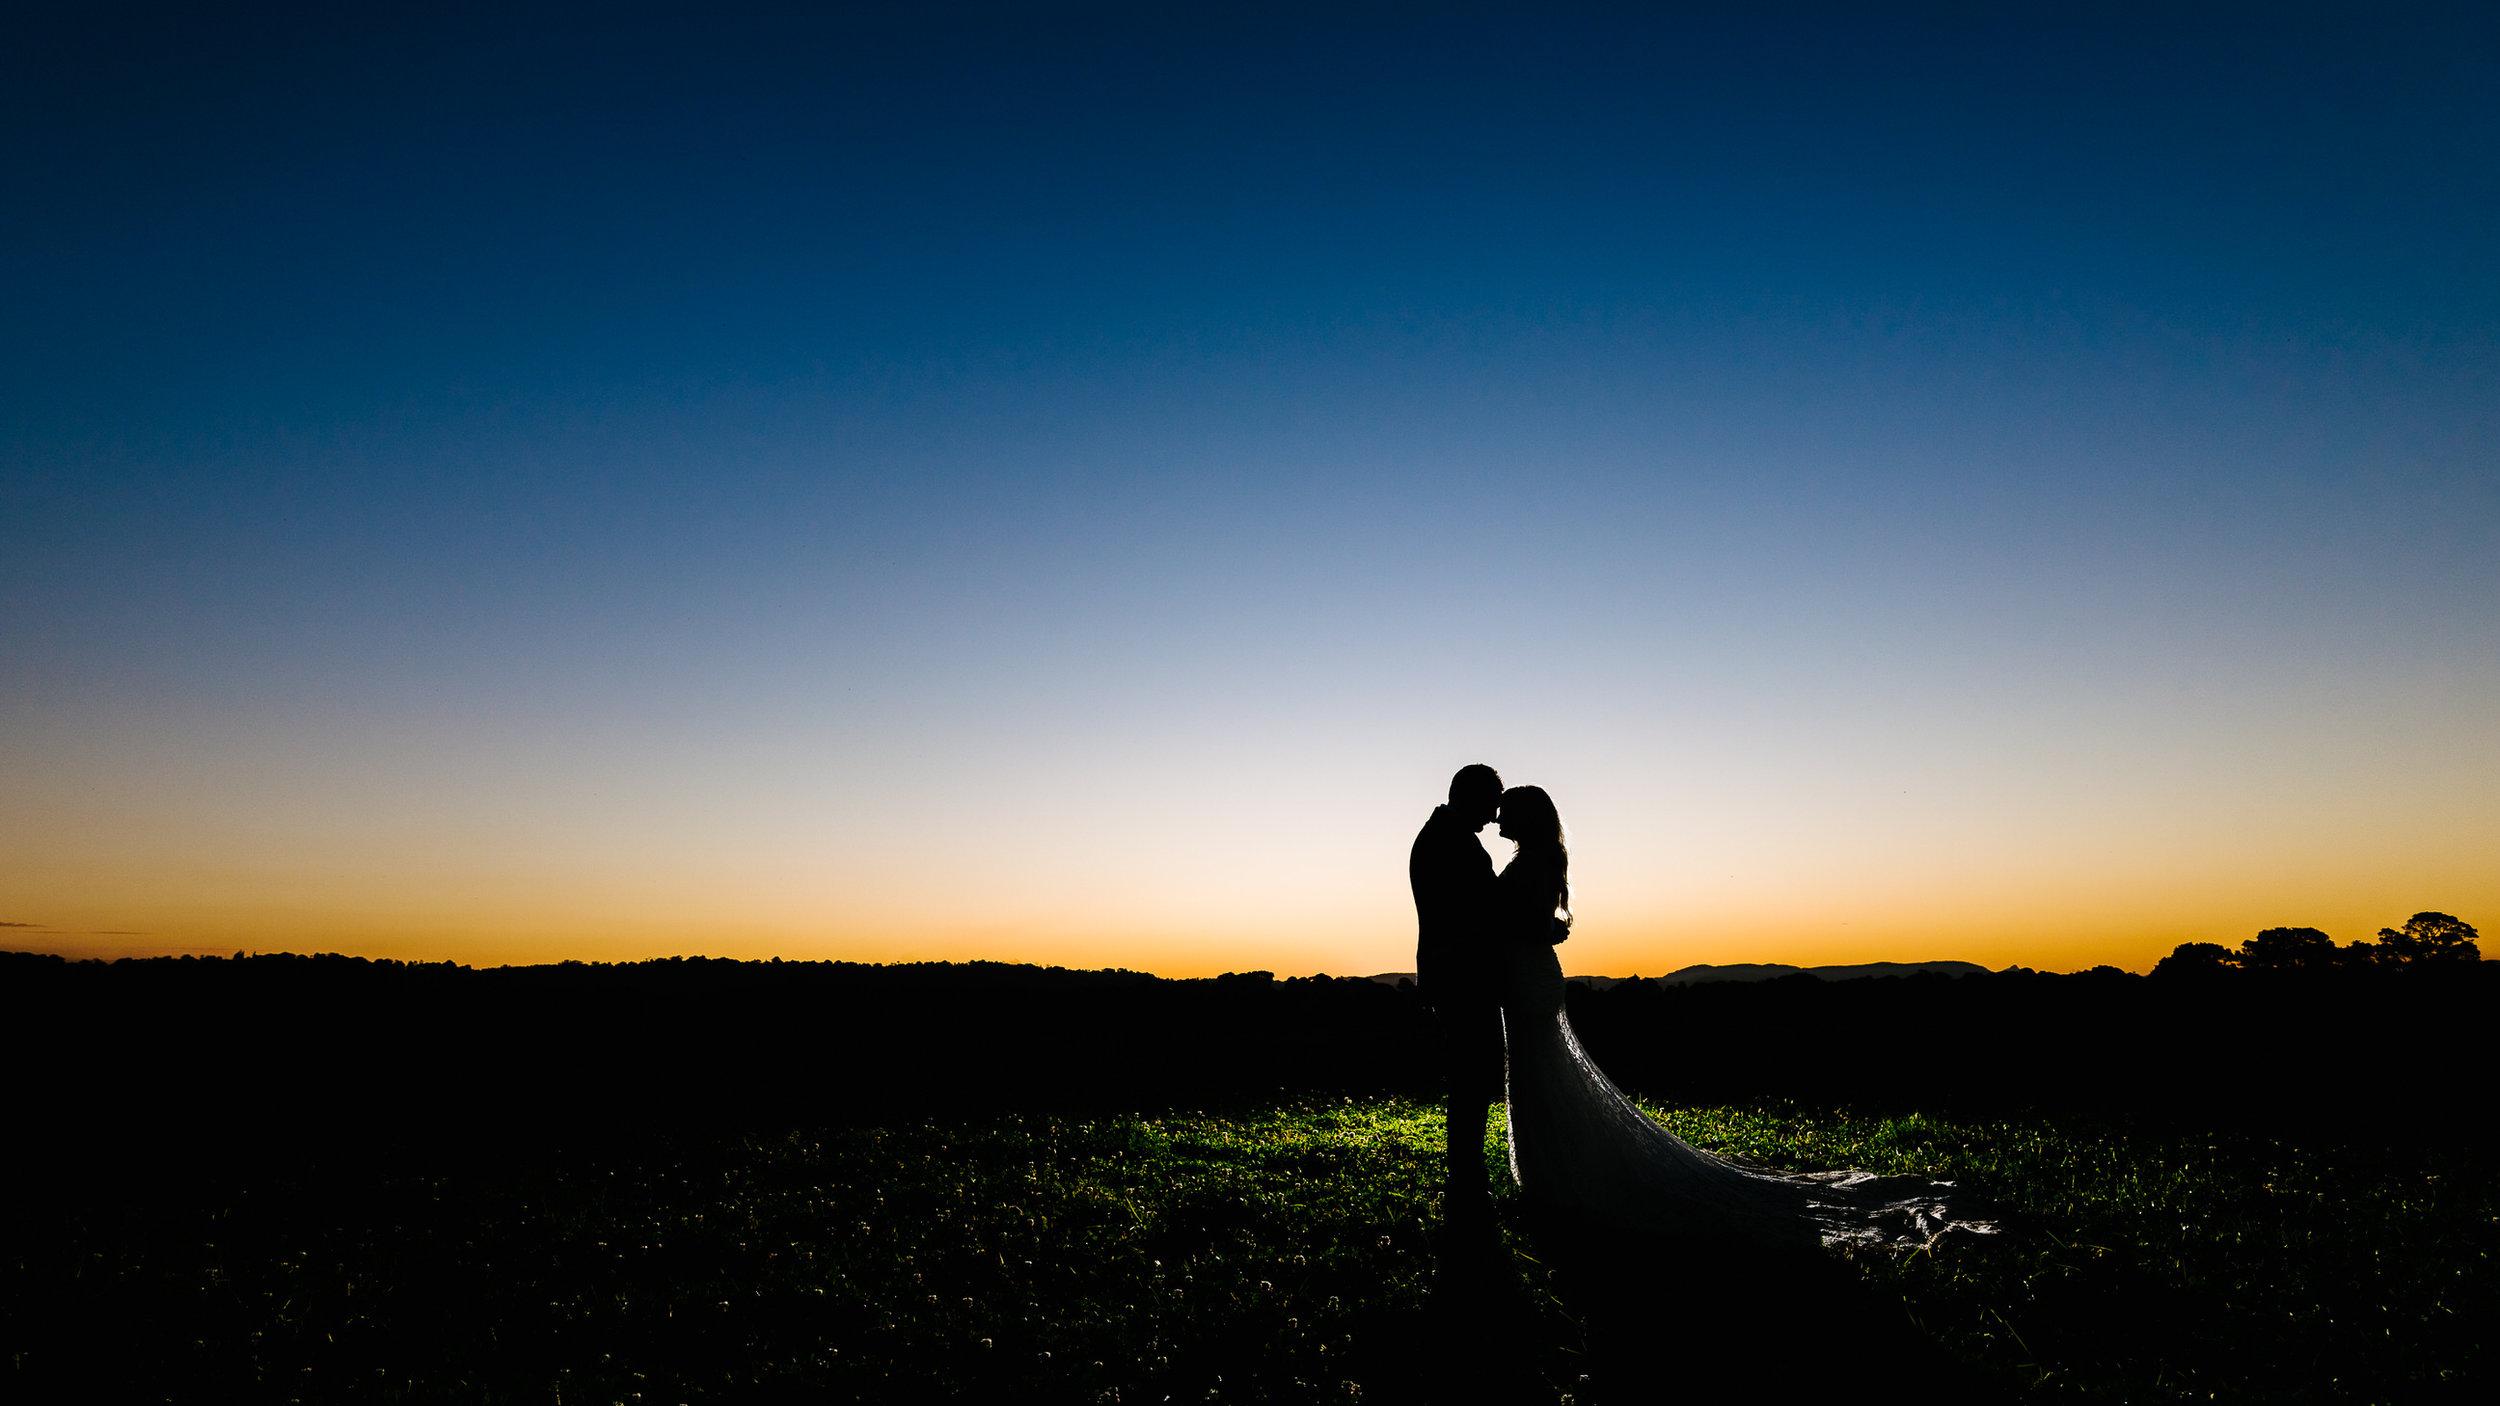 Justin_And_Jim_Photography_Byron_Bay_Wedding088.JPG